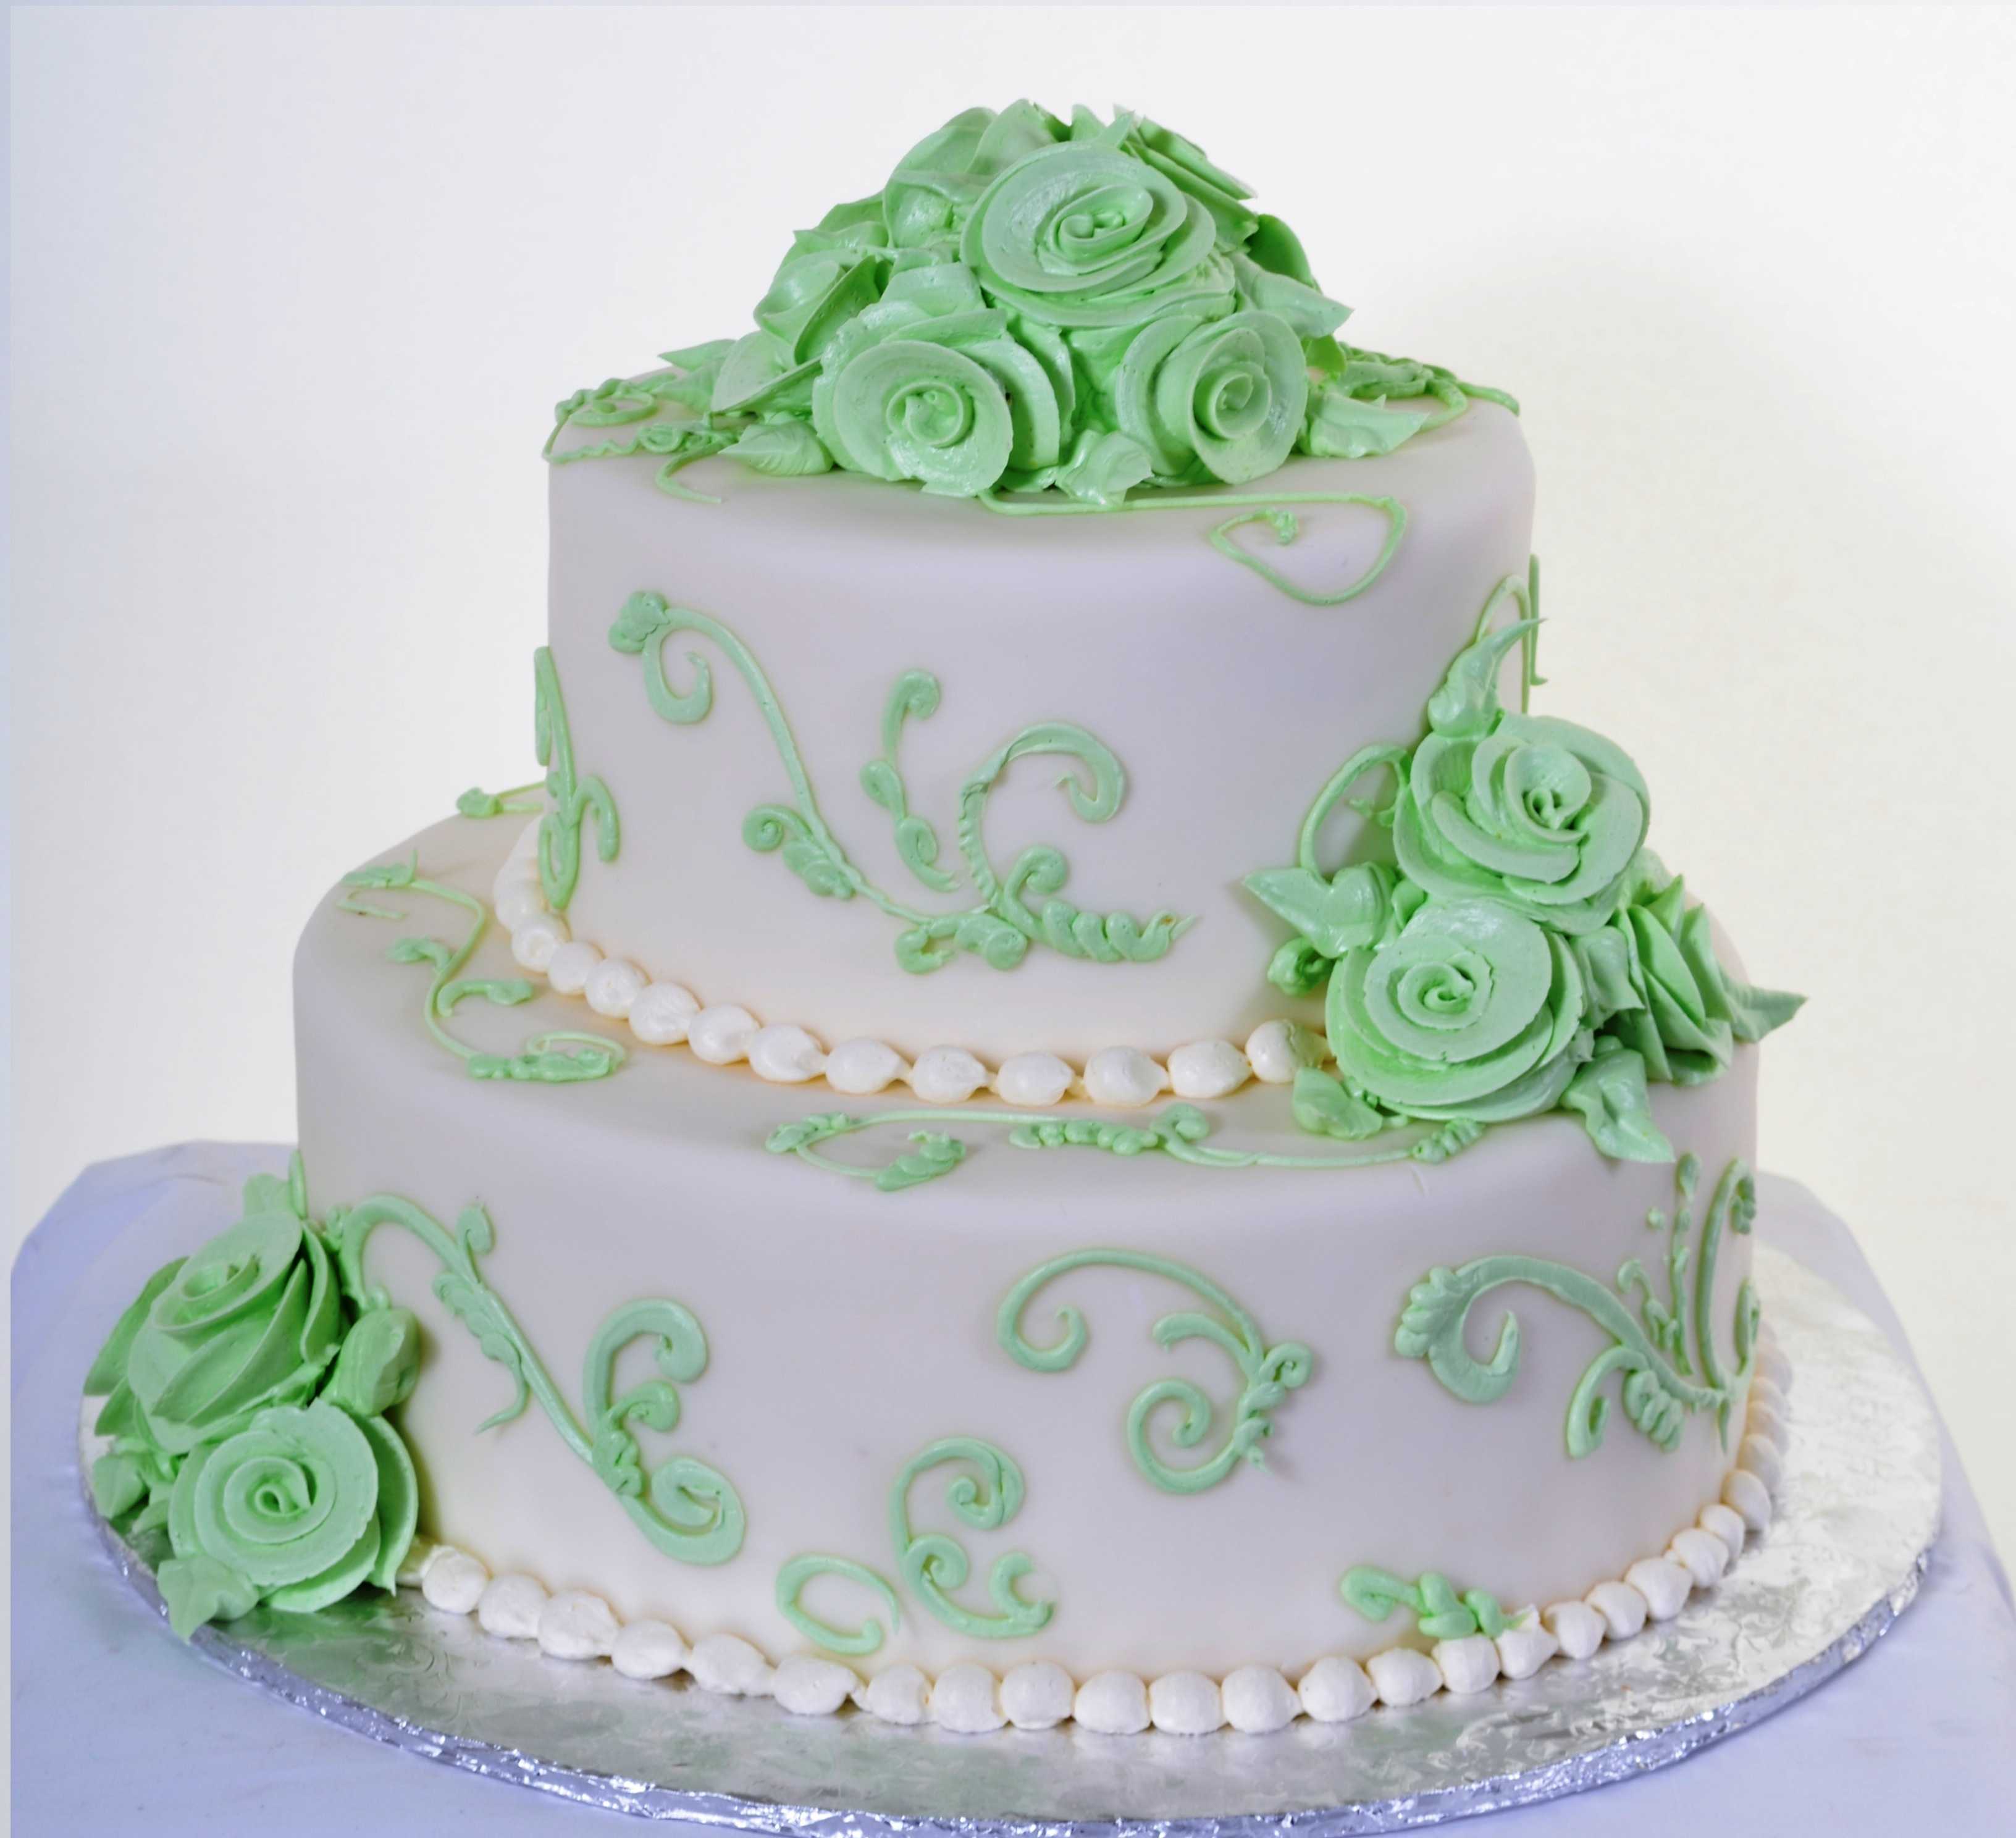 Pastry Palace Las Vegas - Cake 923 - Green Spring